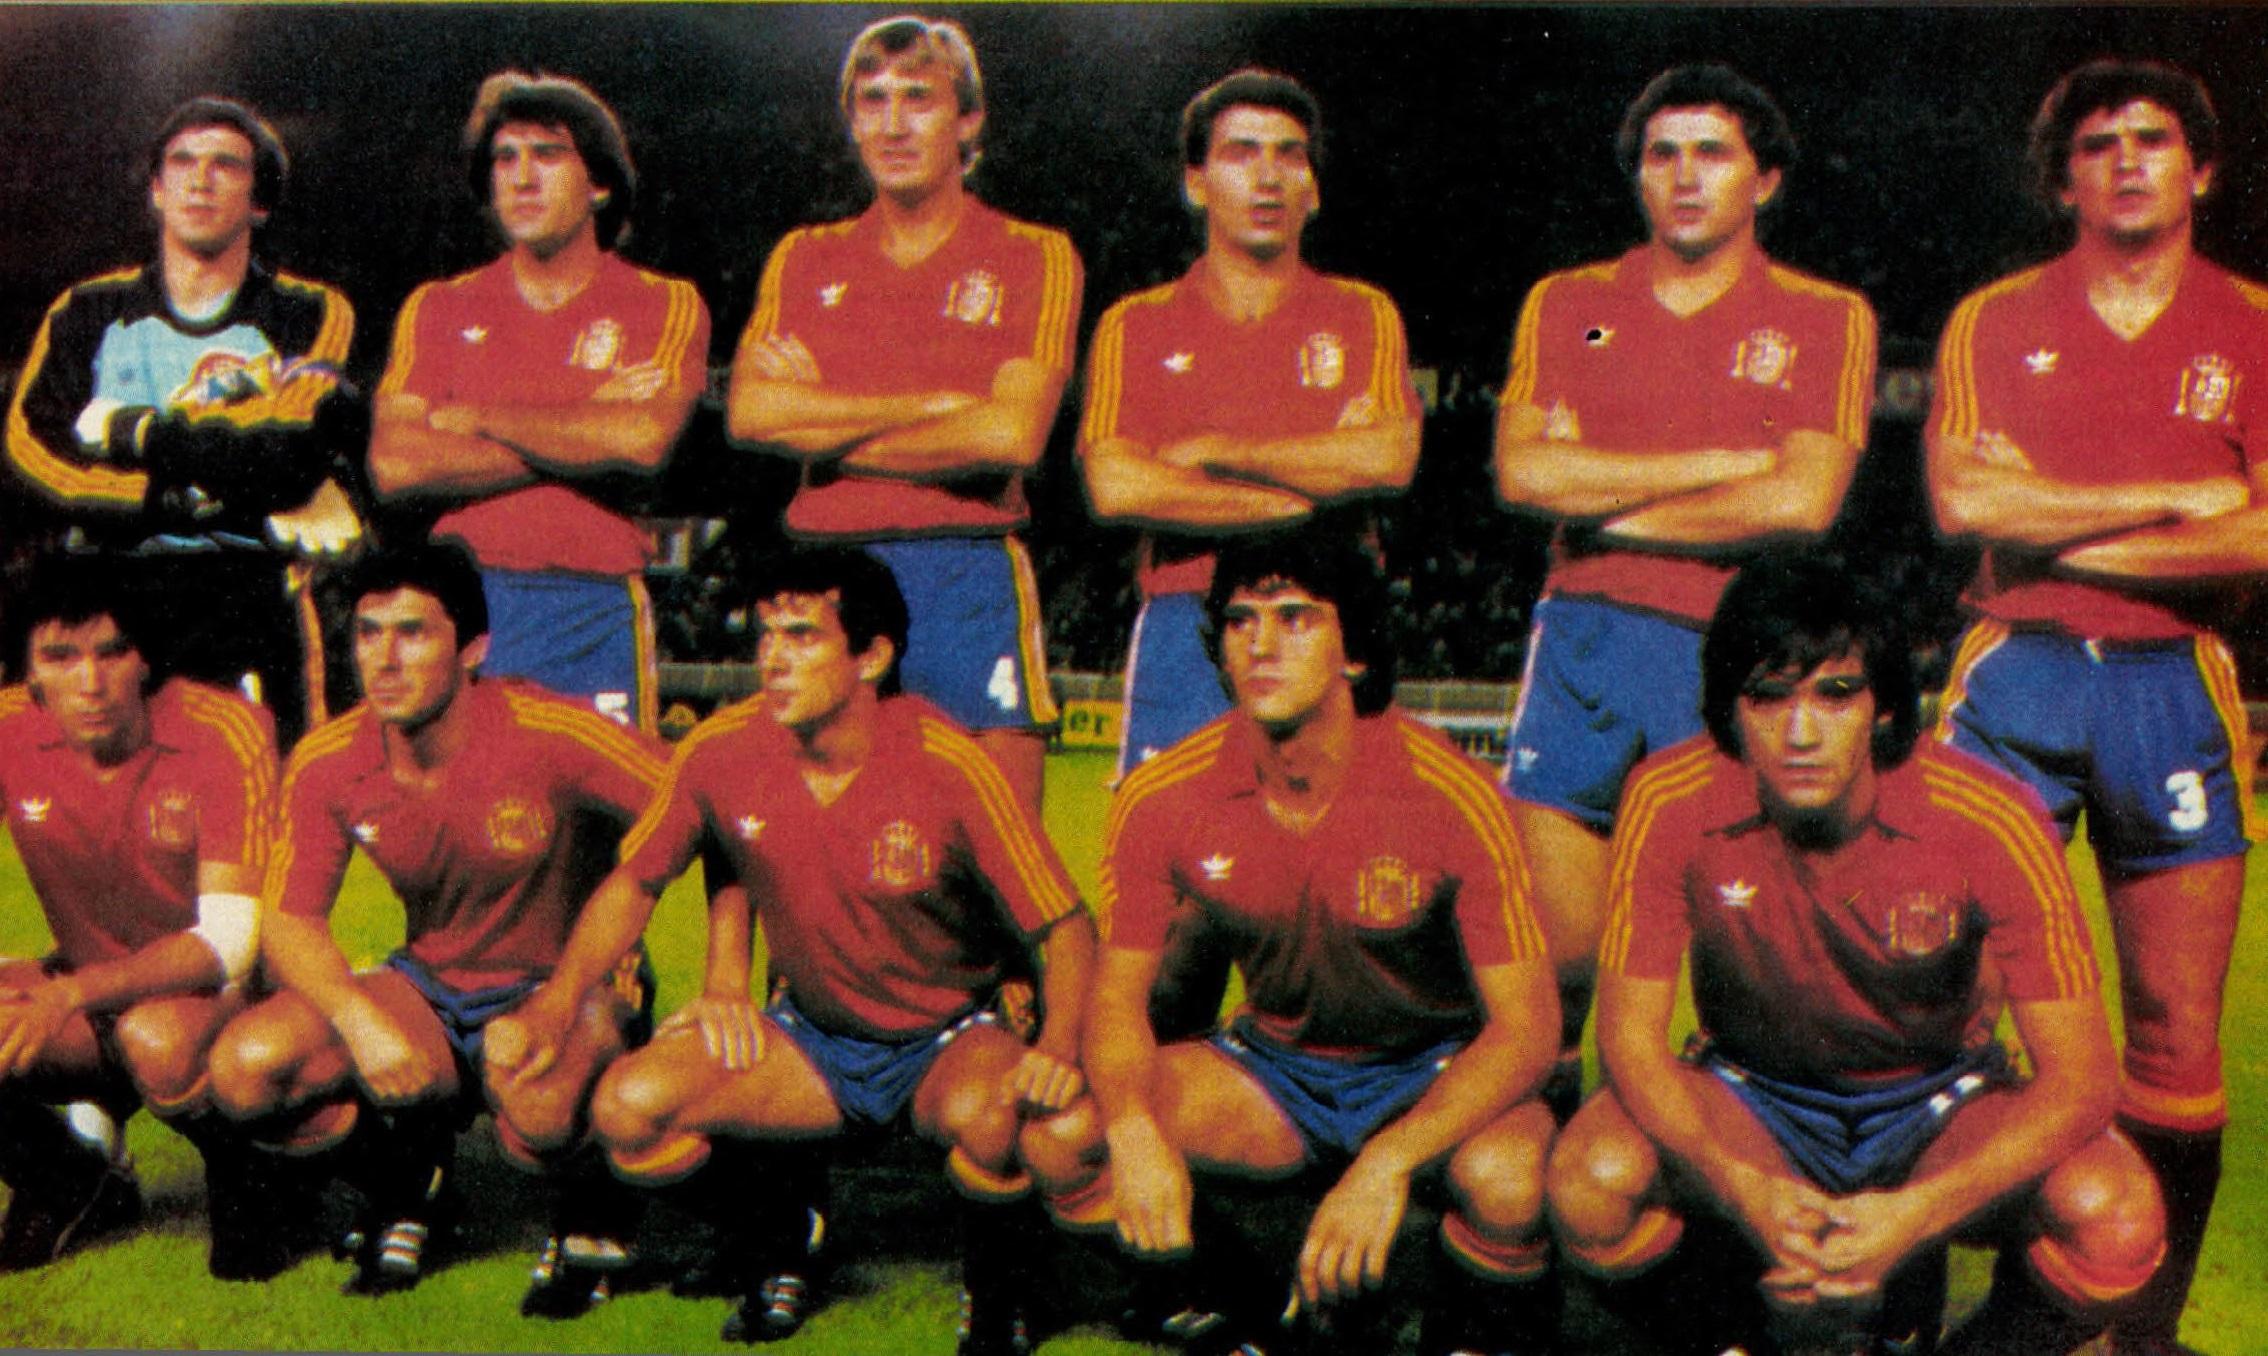 idokapszula_nb_i_1983_84_oszi_zaras_merlegen_az_alsohaz_labdarugo_eb_spanyolorszag.jpg